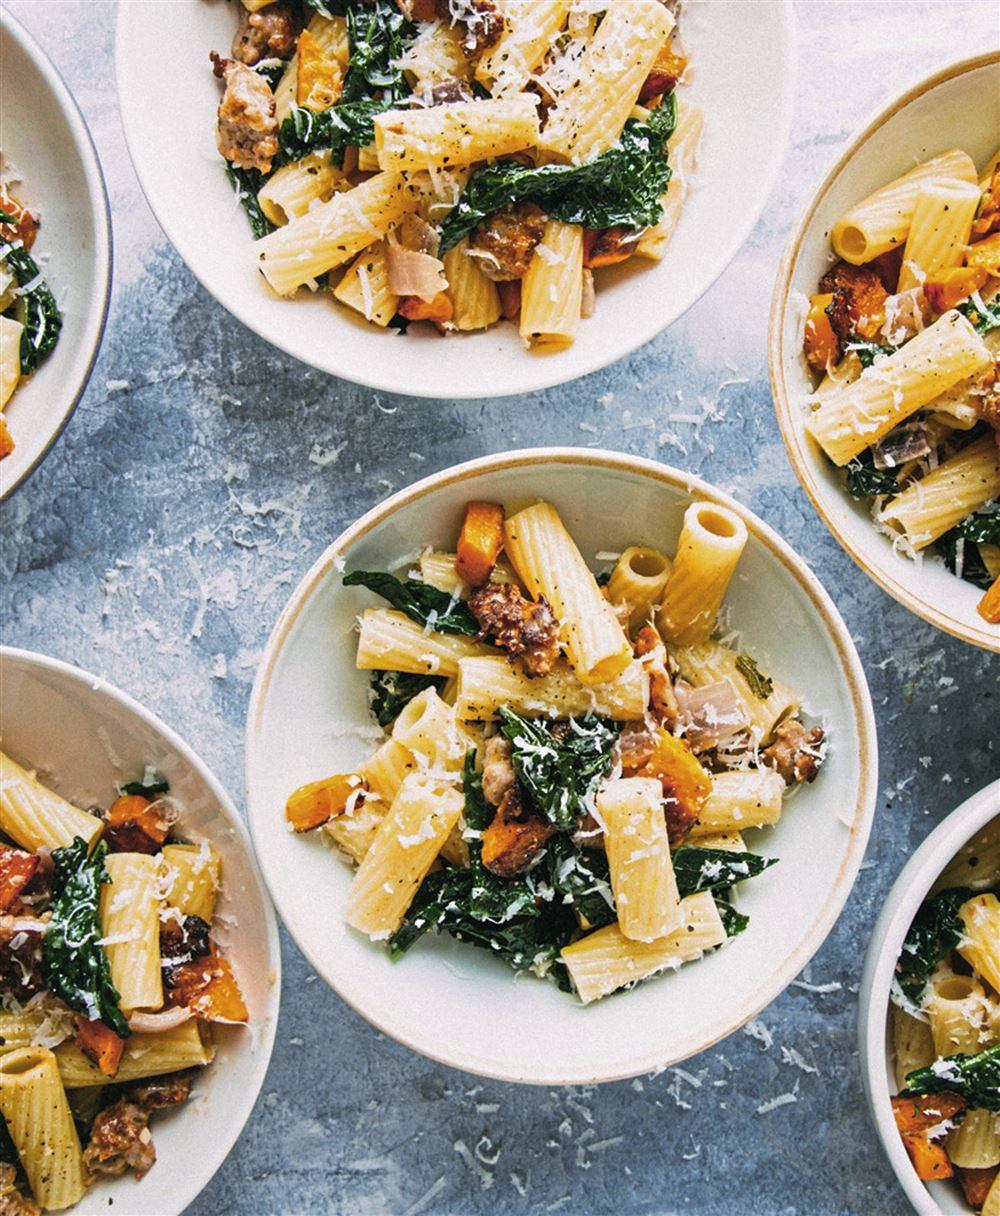 Rigatoni With Squash, Sausage and Kale